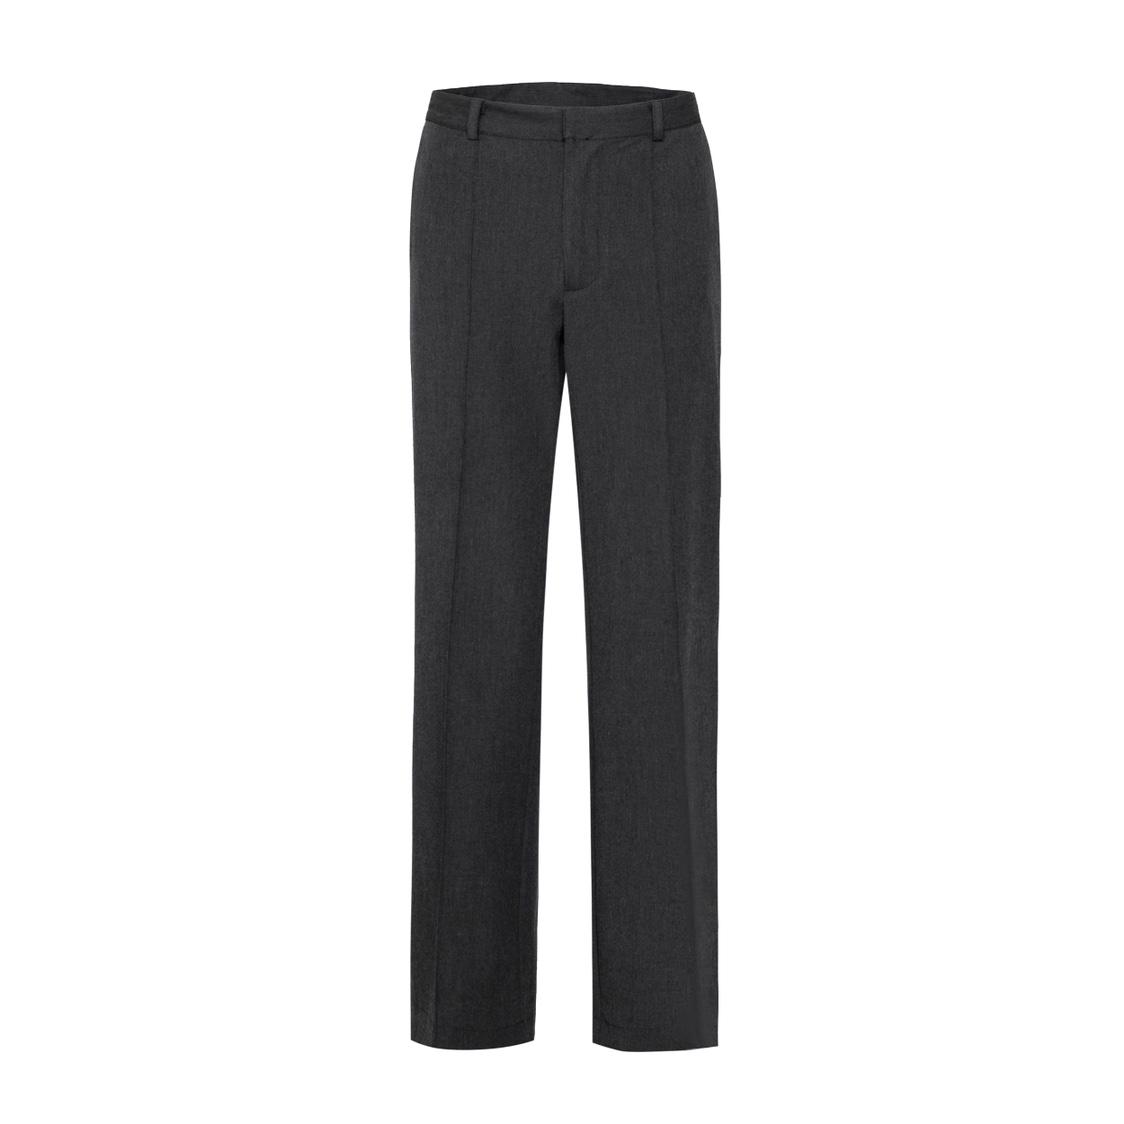 MUKHINA 19AW 深灰色开叉精裁阔腿西裤 百搭高端质感 羊毛混纺